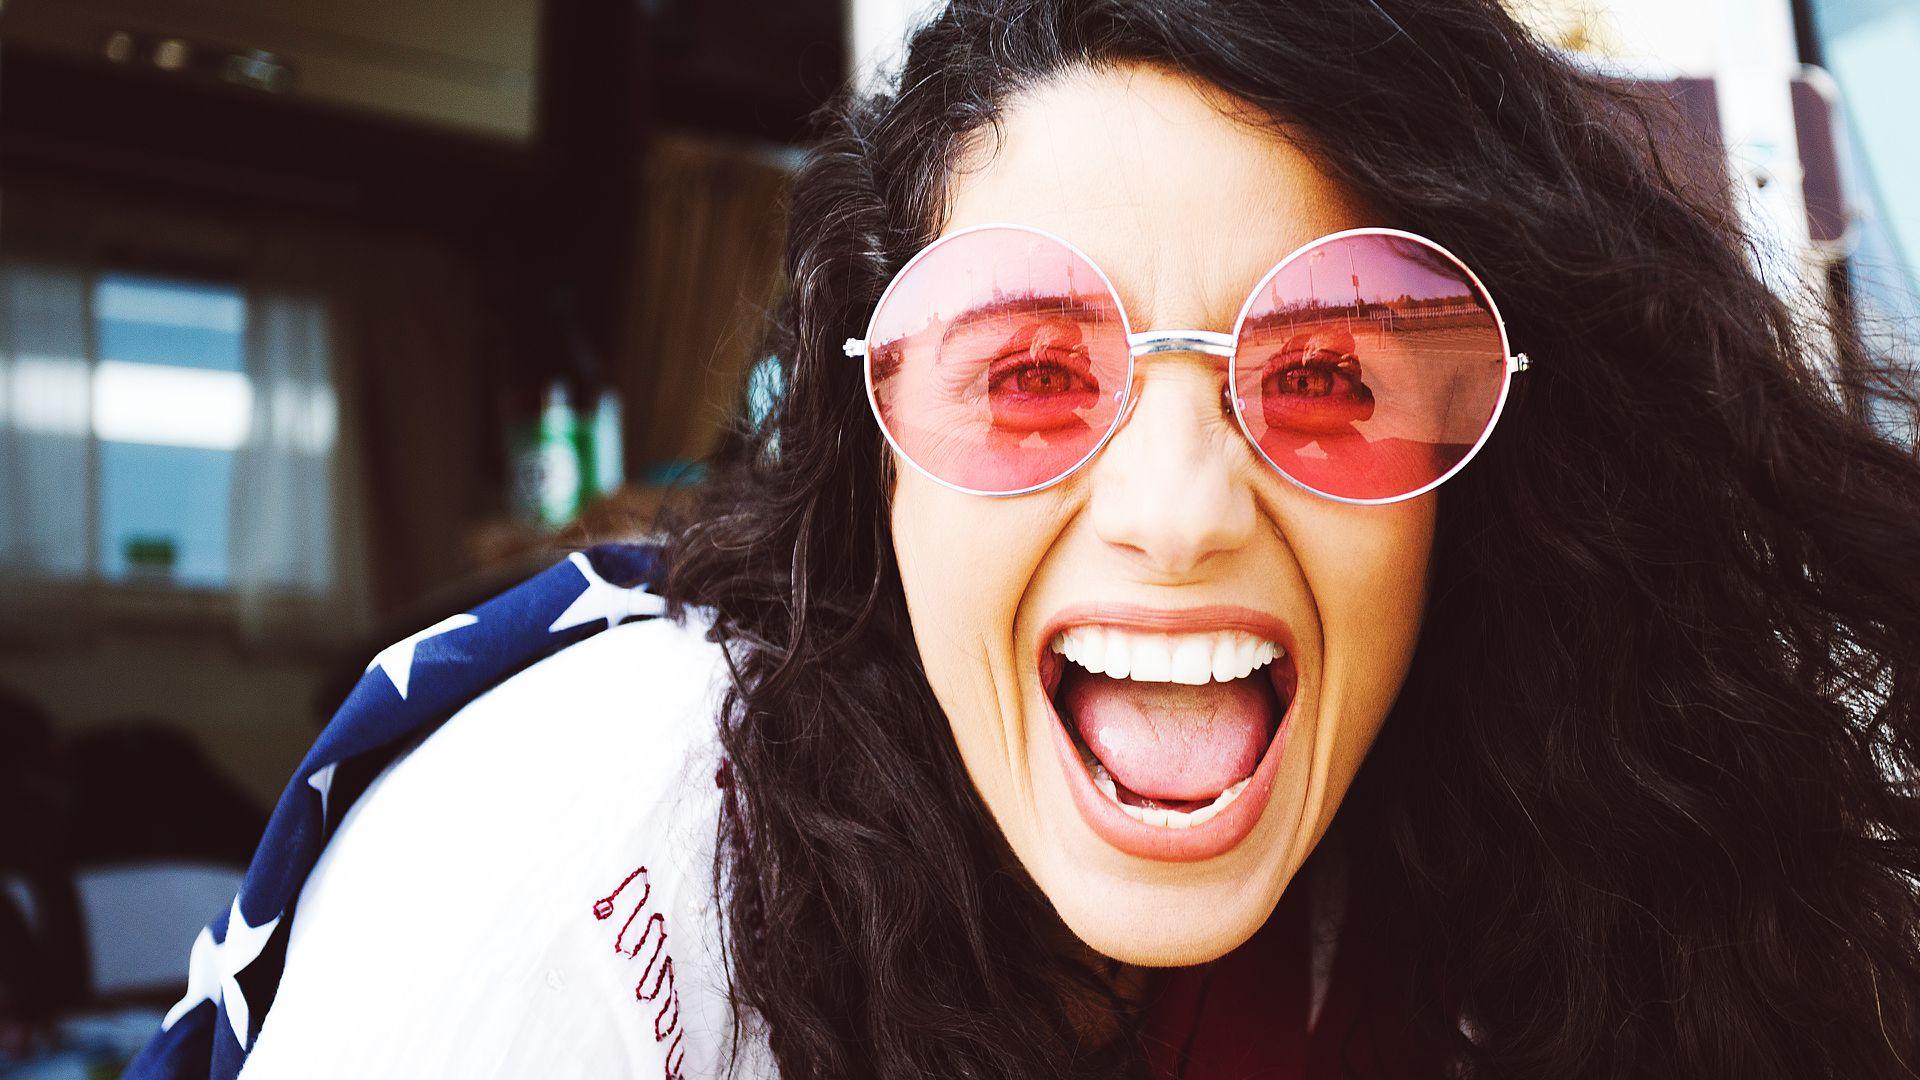 Imagem de menina com óculos de sol colorido